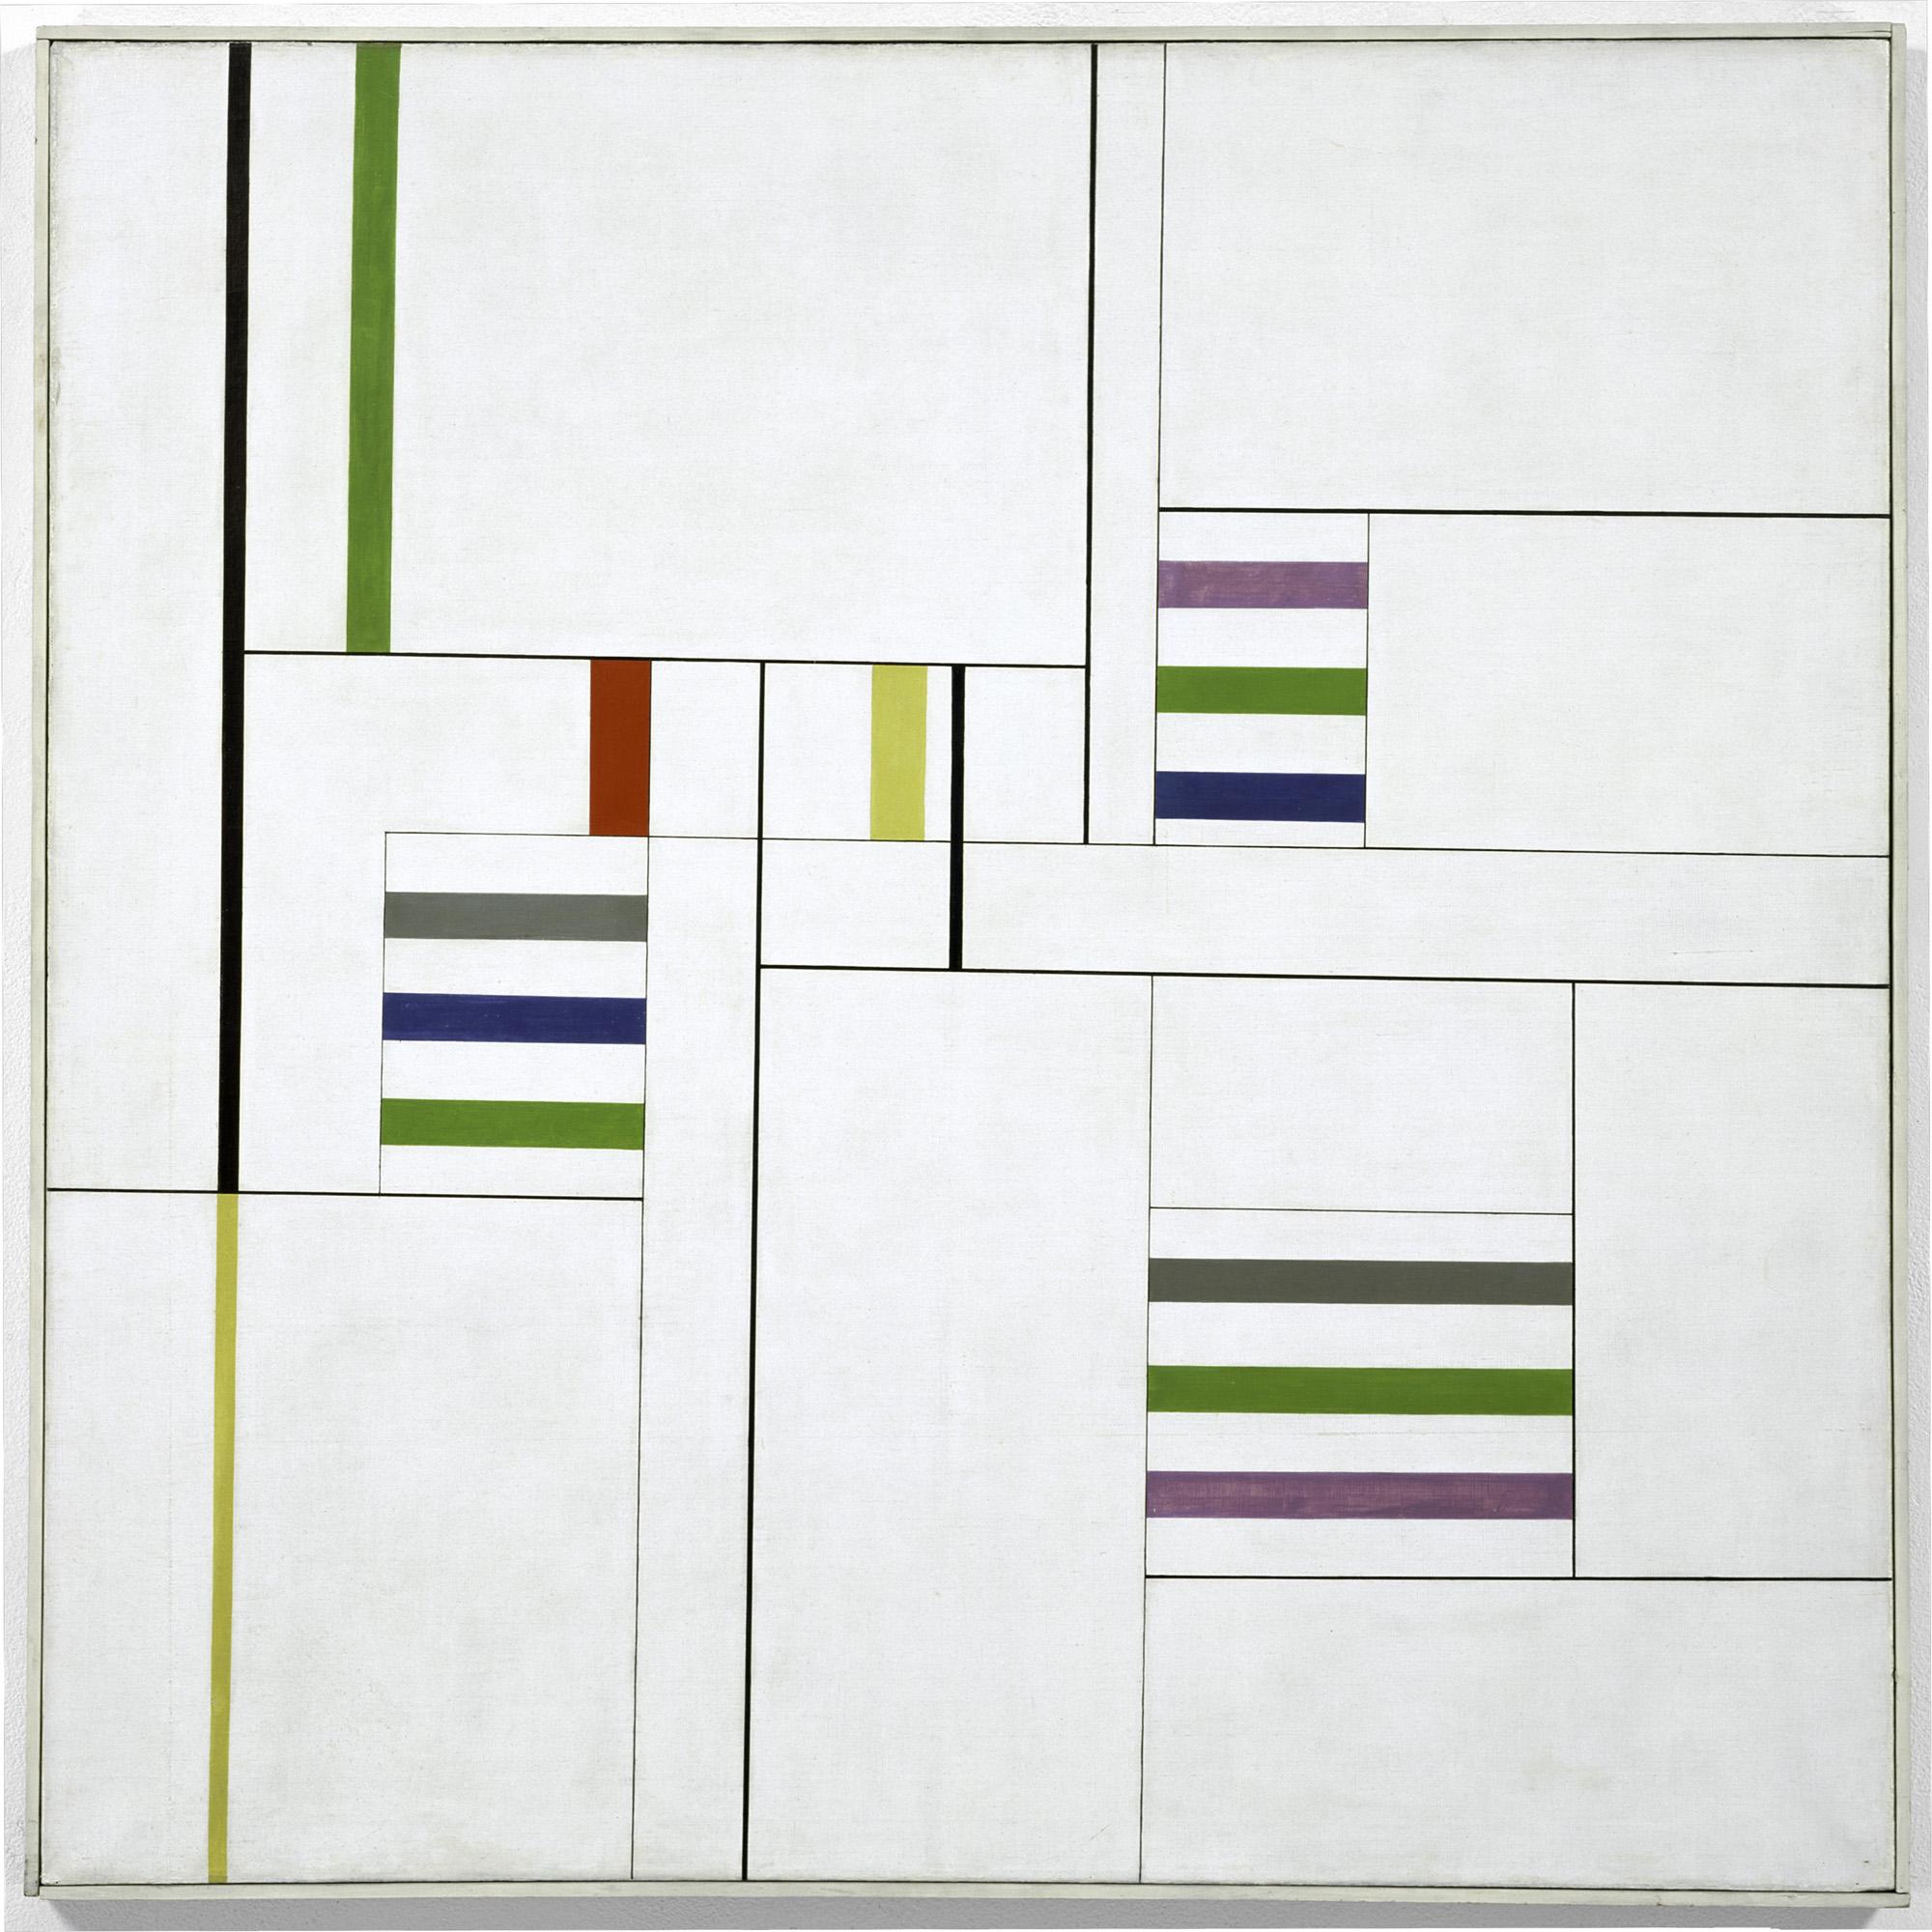 Alfredo Hlito (Argentine, 1923–1993). Ritmos cromáticos III (Chromatic Rhythms III), 1949. Oil on canvas, 39 3/8 × 39 3/8″ (100 × 100 cm). The Museum of Modern Art, New York